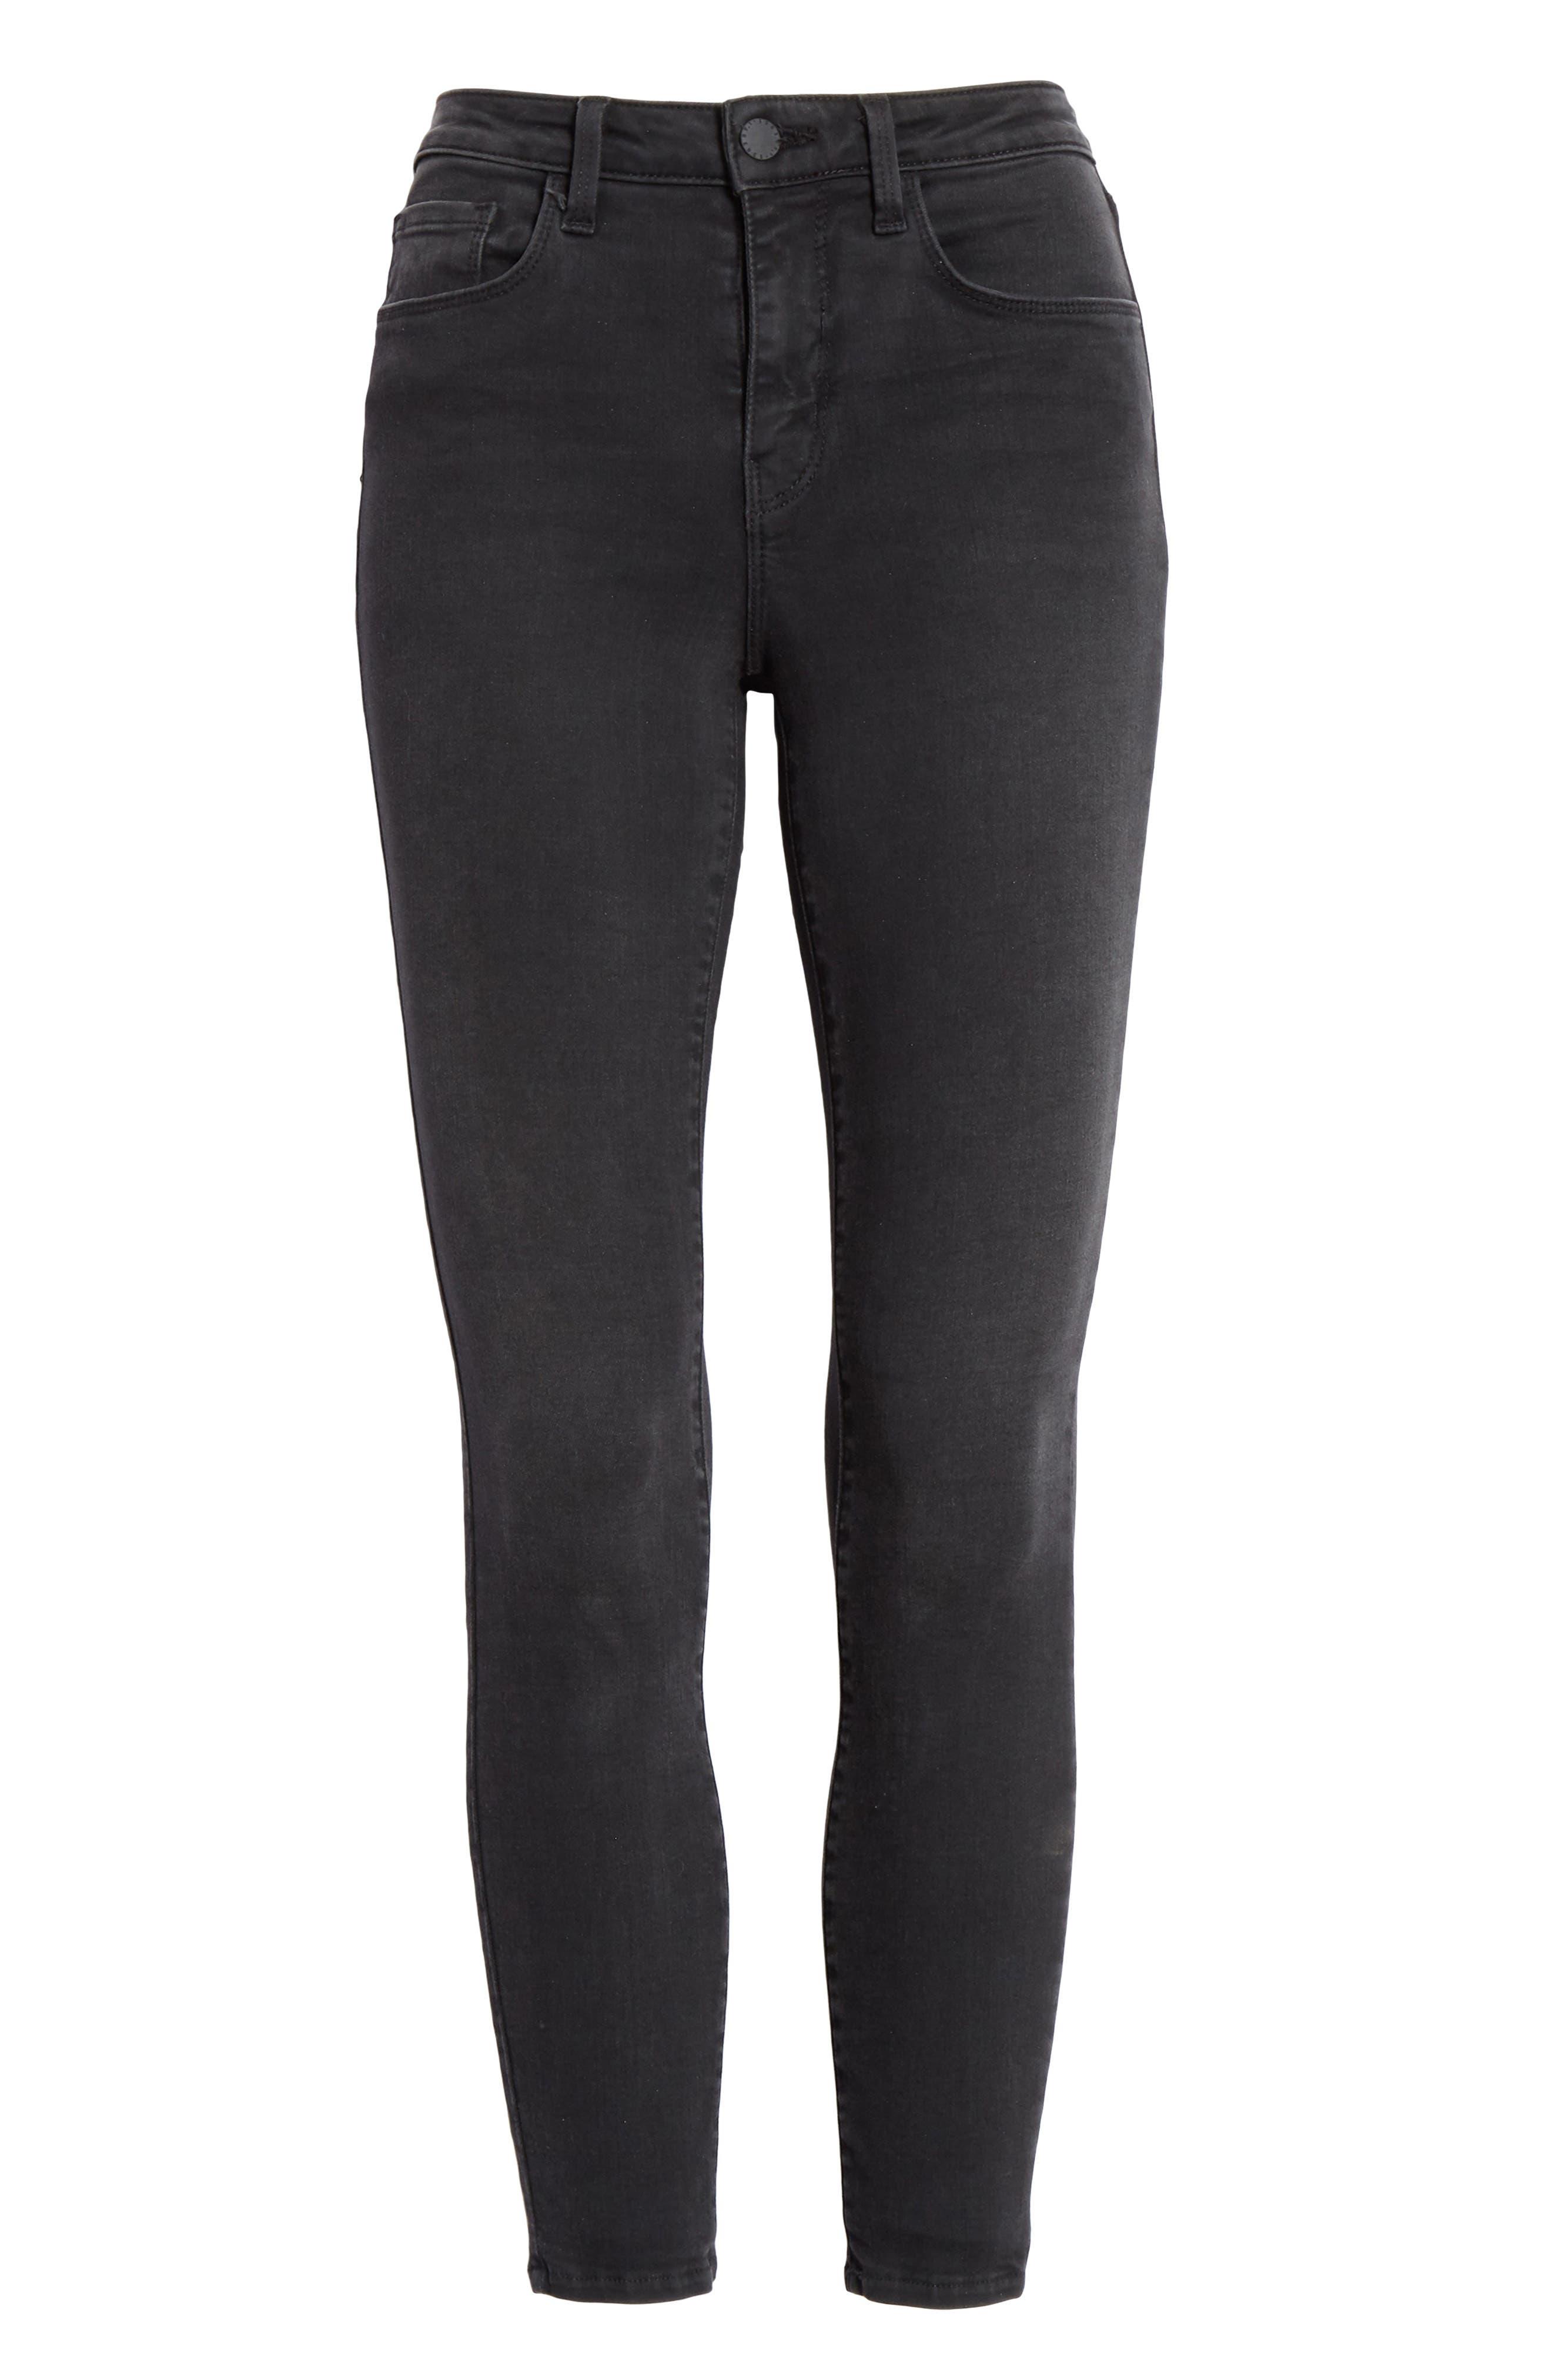 Margot Crop Skinny Jeans,                             Alternate thumbnail 6, color,                             DARK GRAPHITE